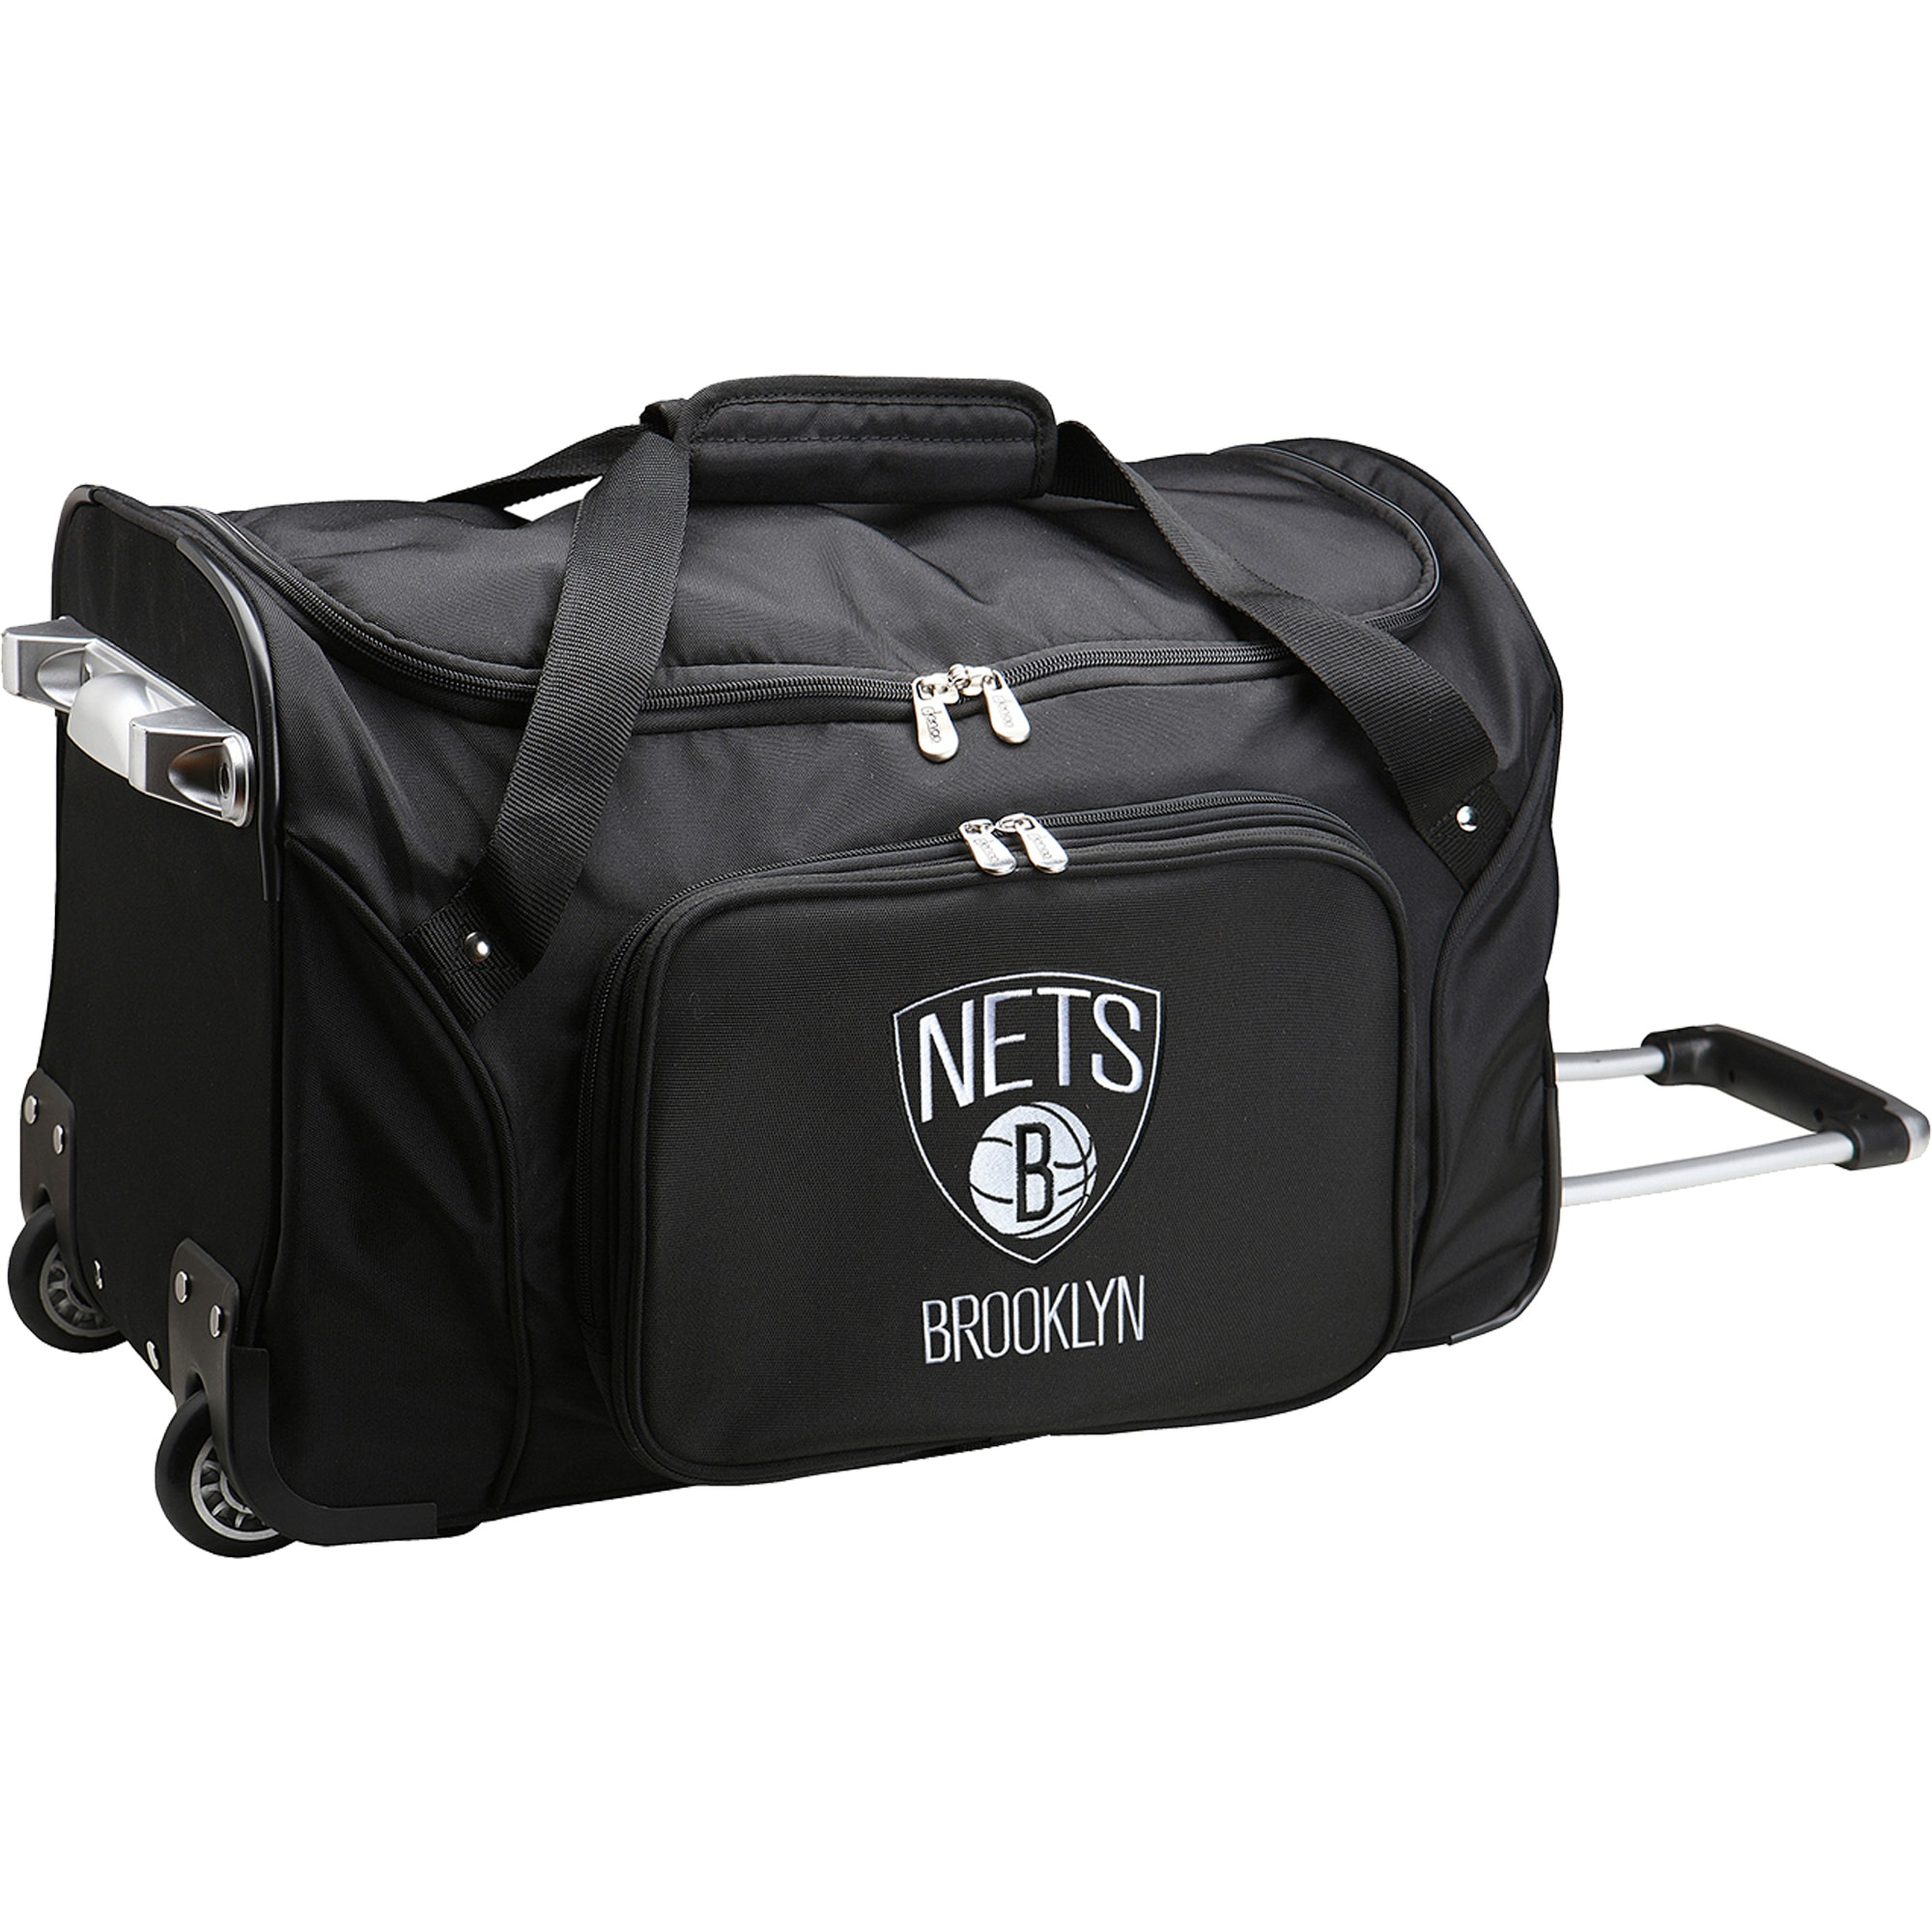 "Brooklyn Nets 22"" 2-Wheeled Duffel Bag - Black"